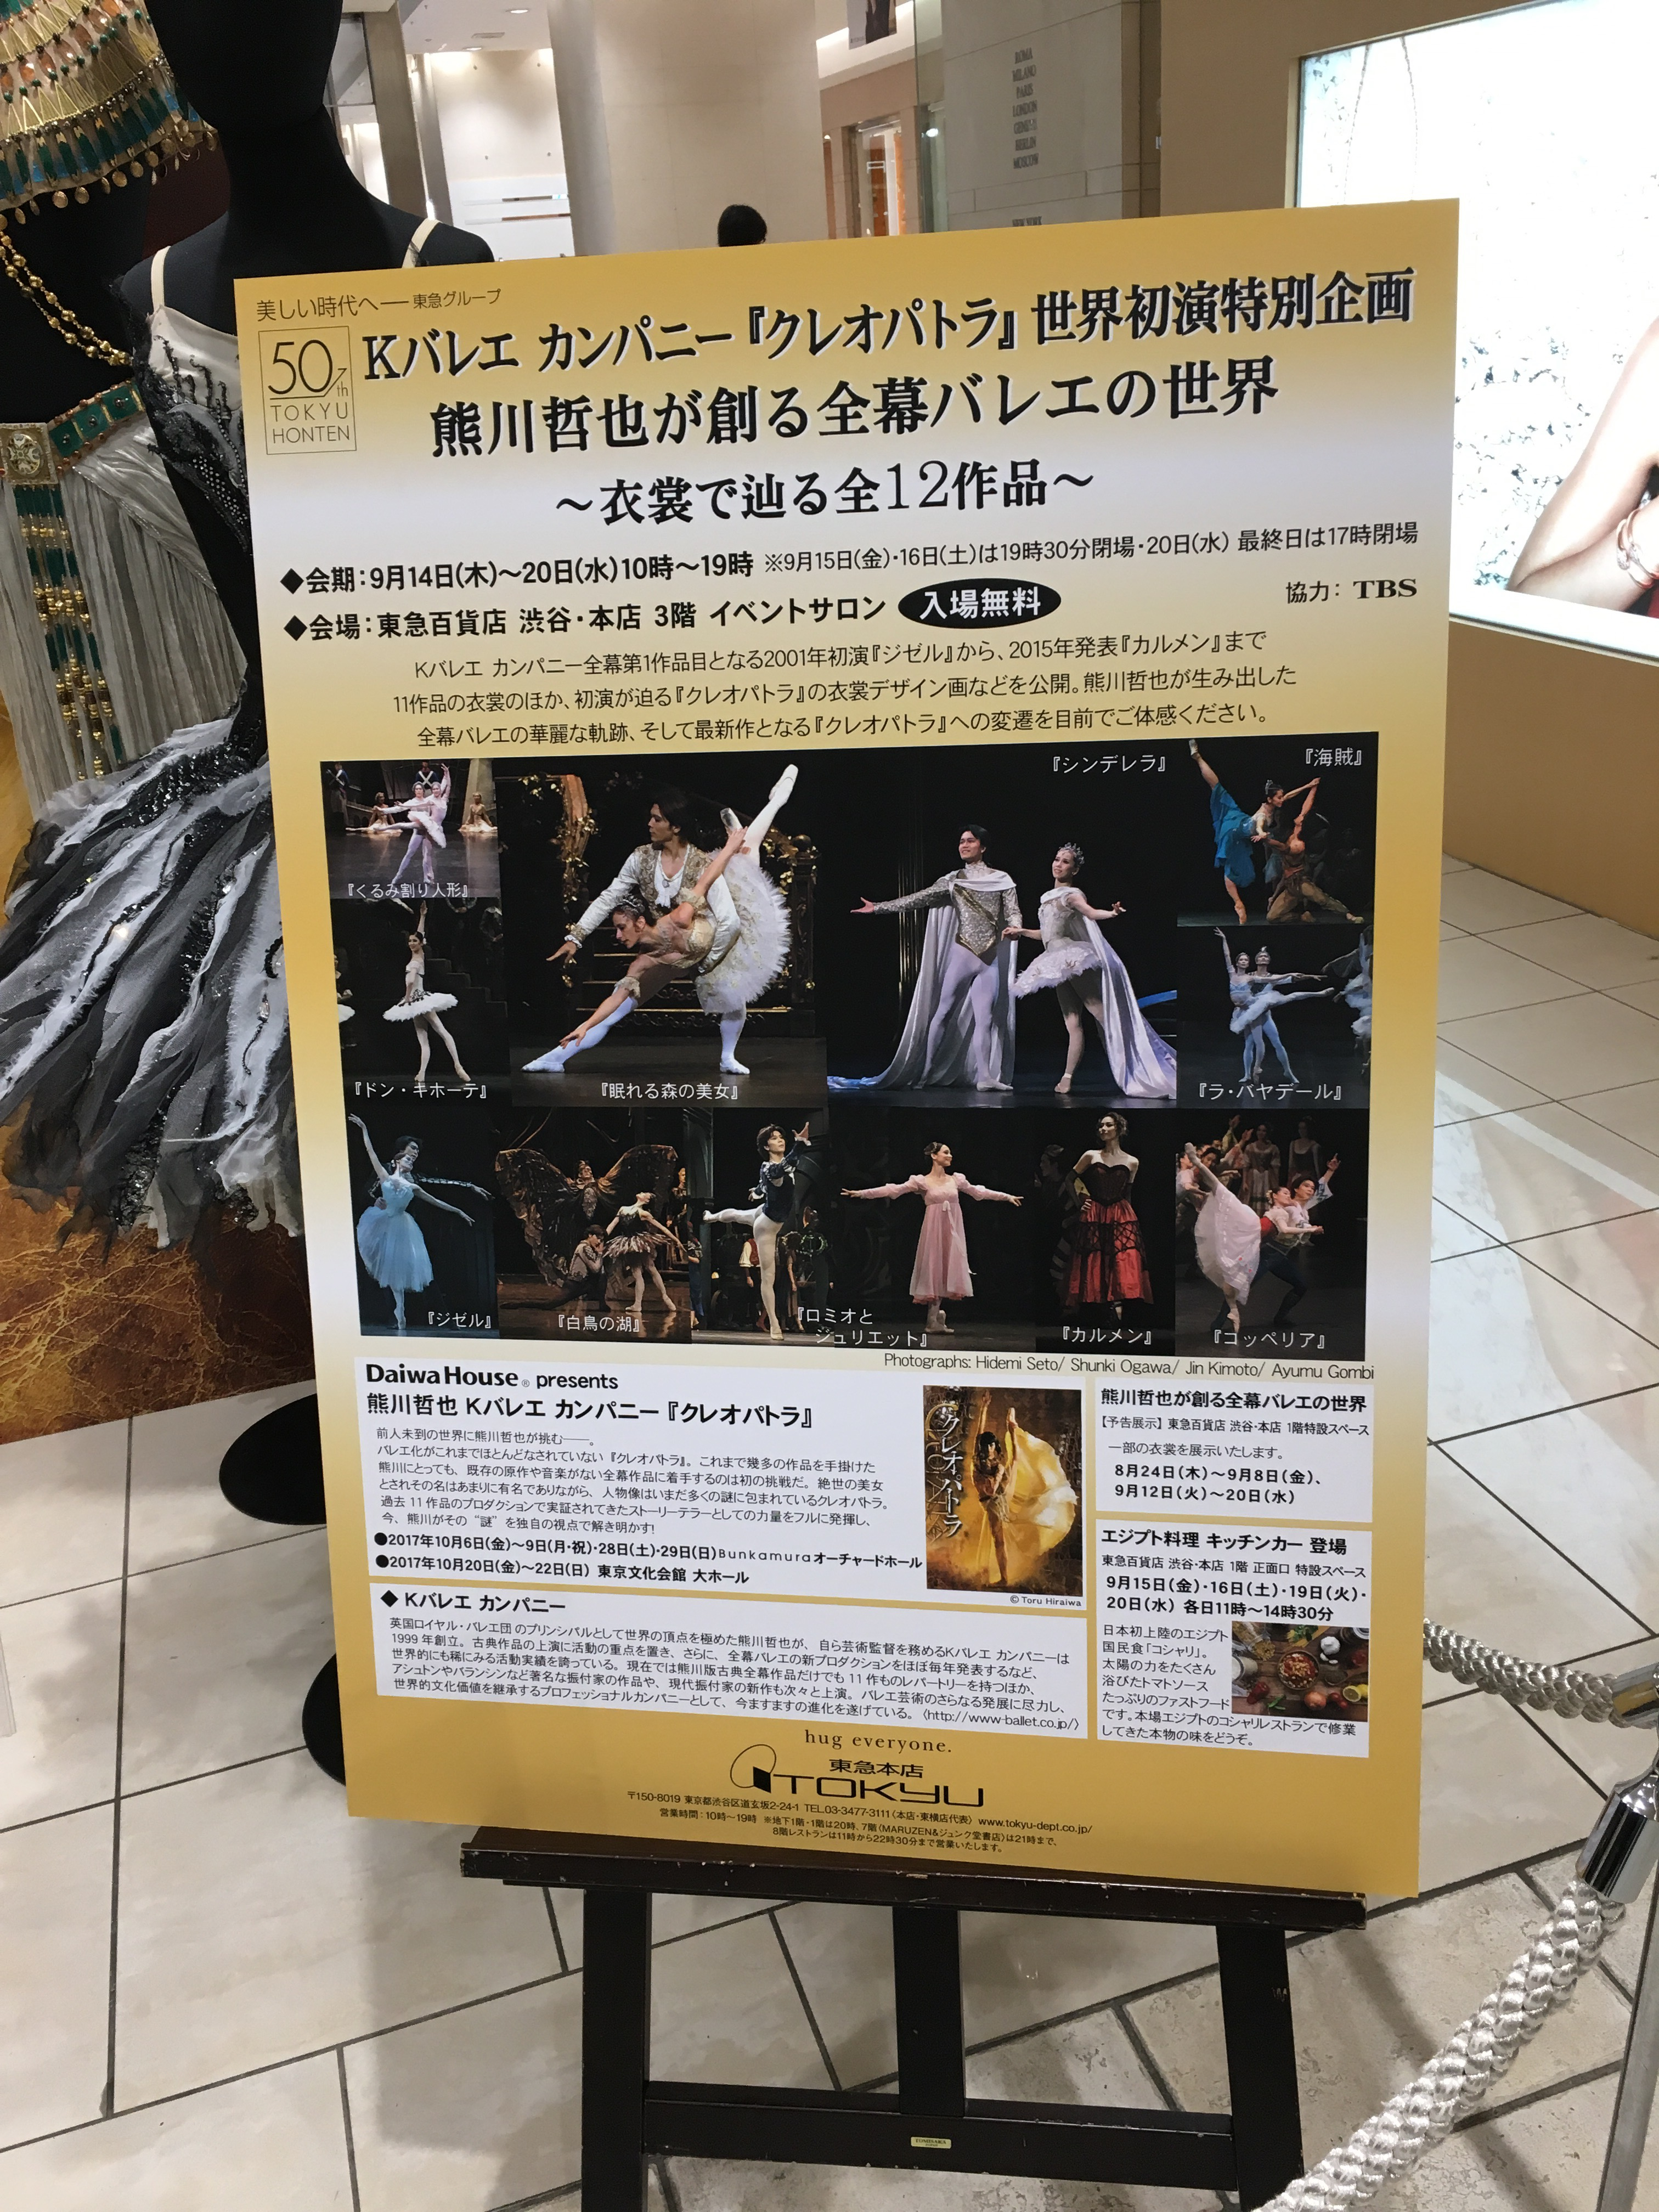 K ballet company 新作「クレオパトラ」